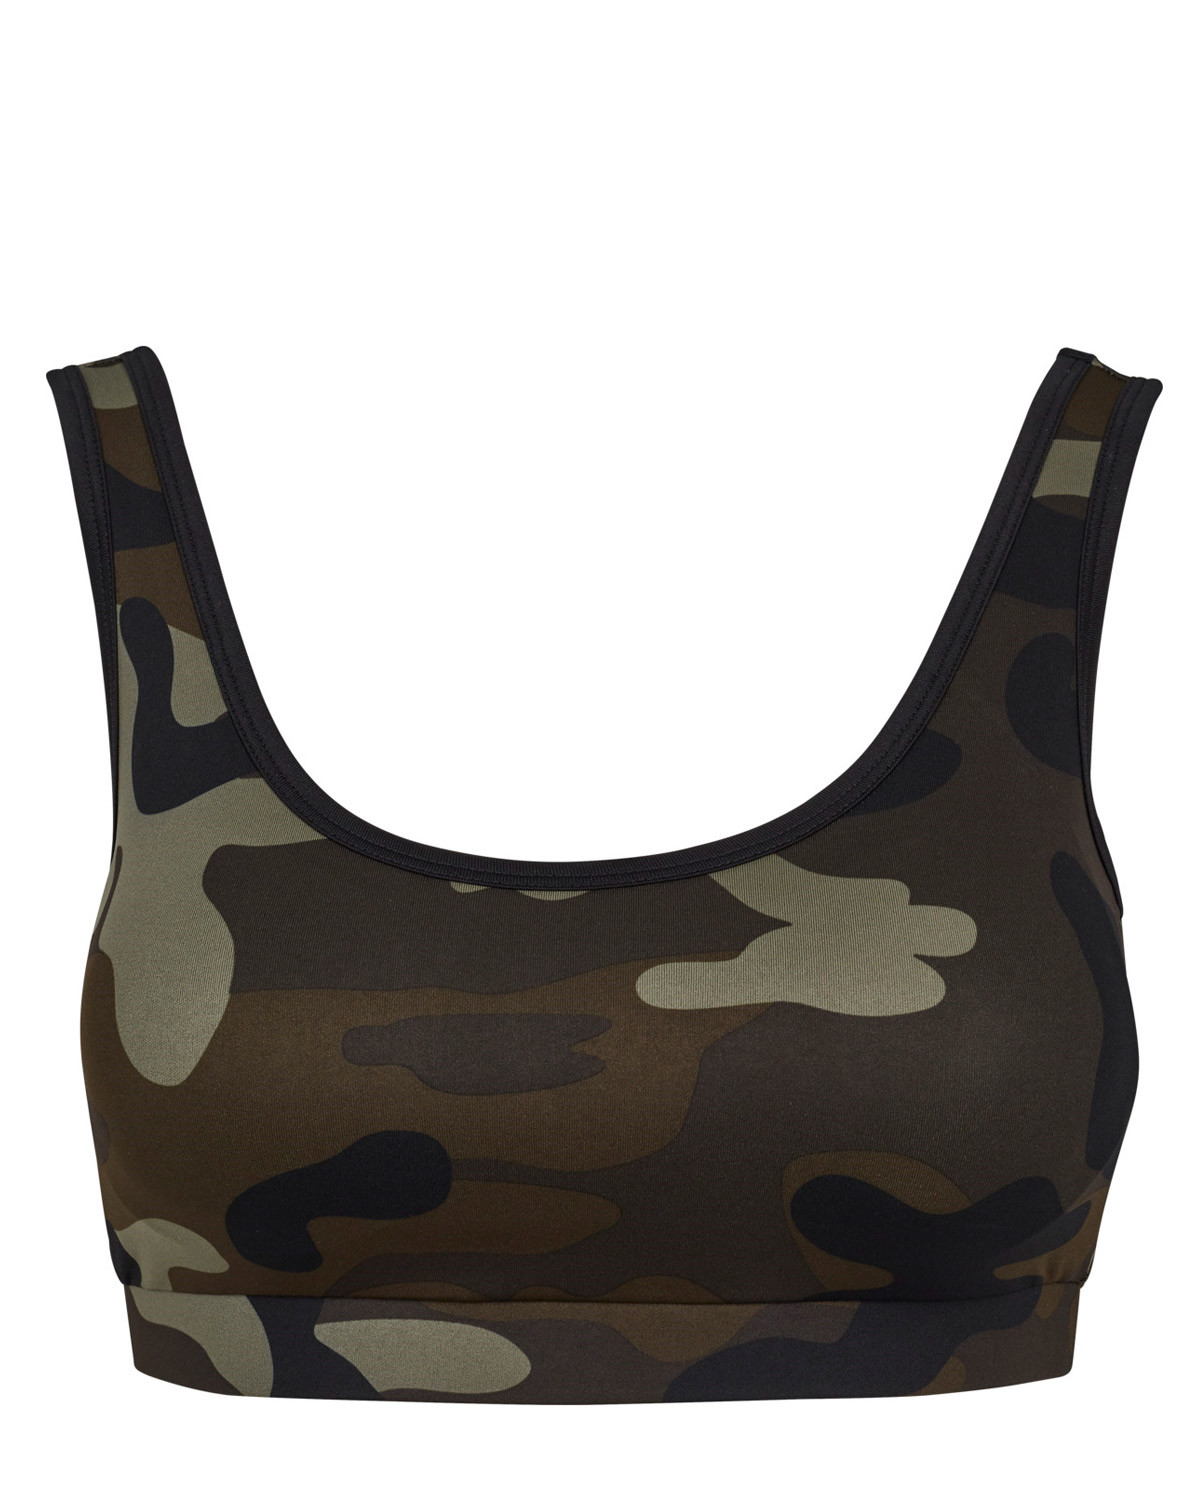 Image of   Urban Classics Camouflage BH (Woodland, L)